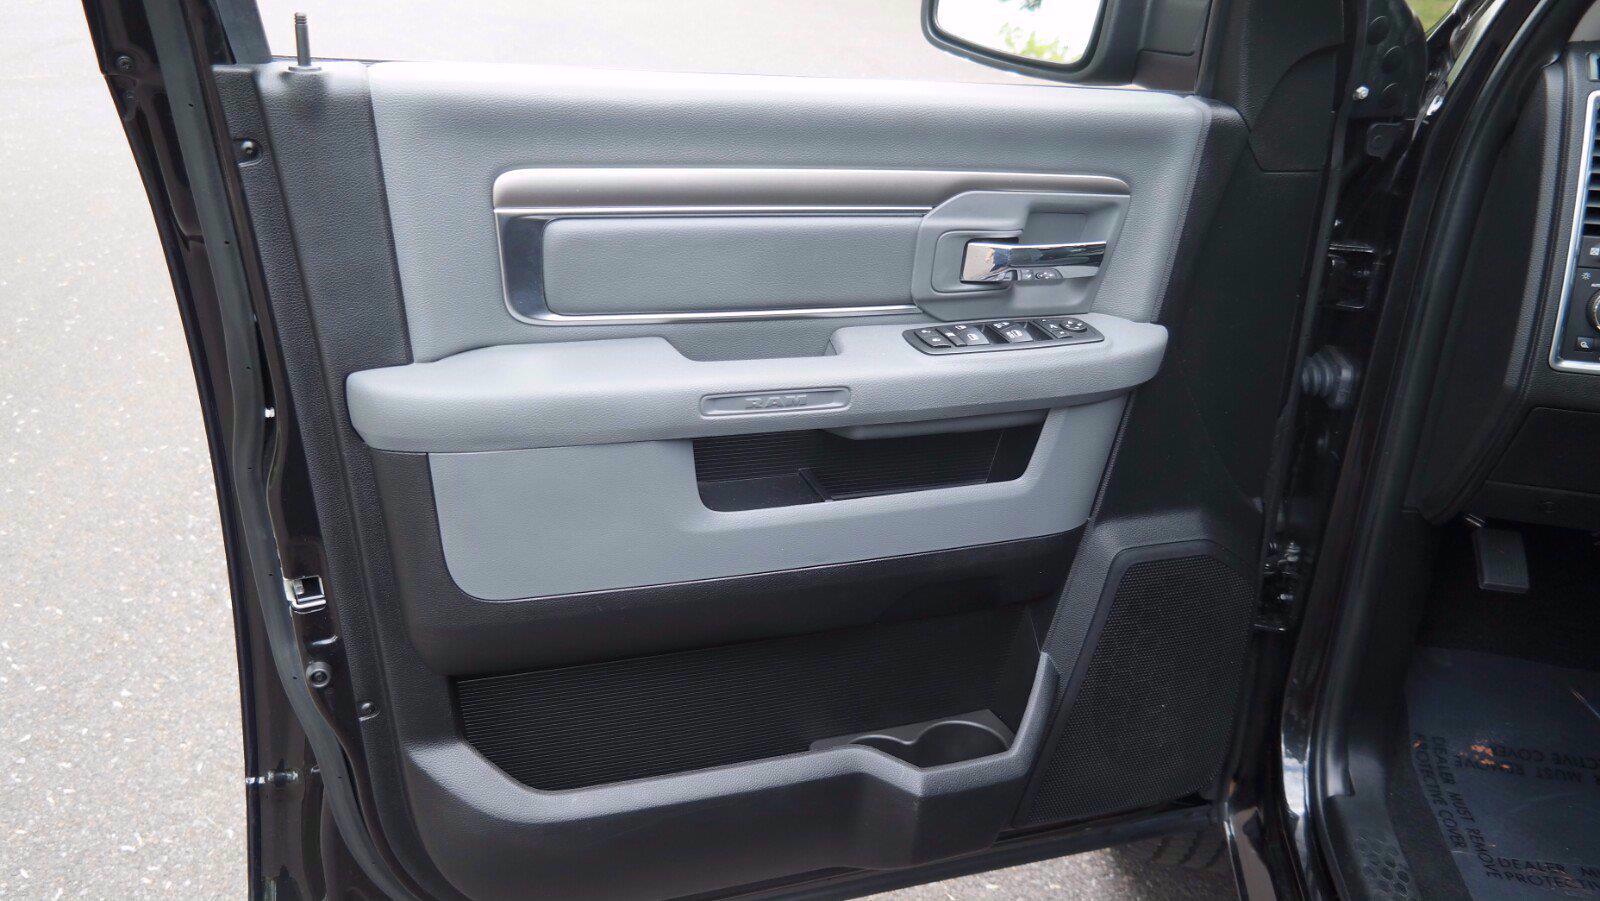 2018 Ram 1500 Crew Cab 4x4, Pickup #FL103691 - photo 19